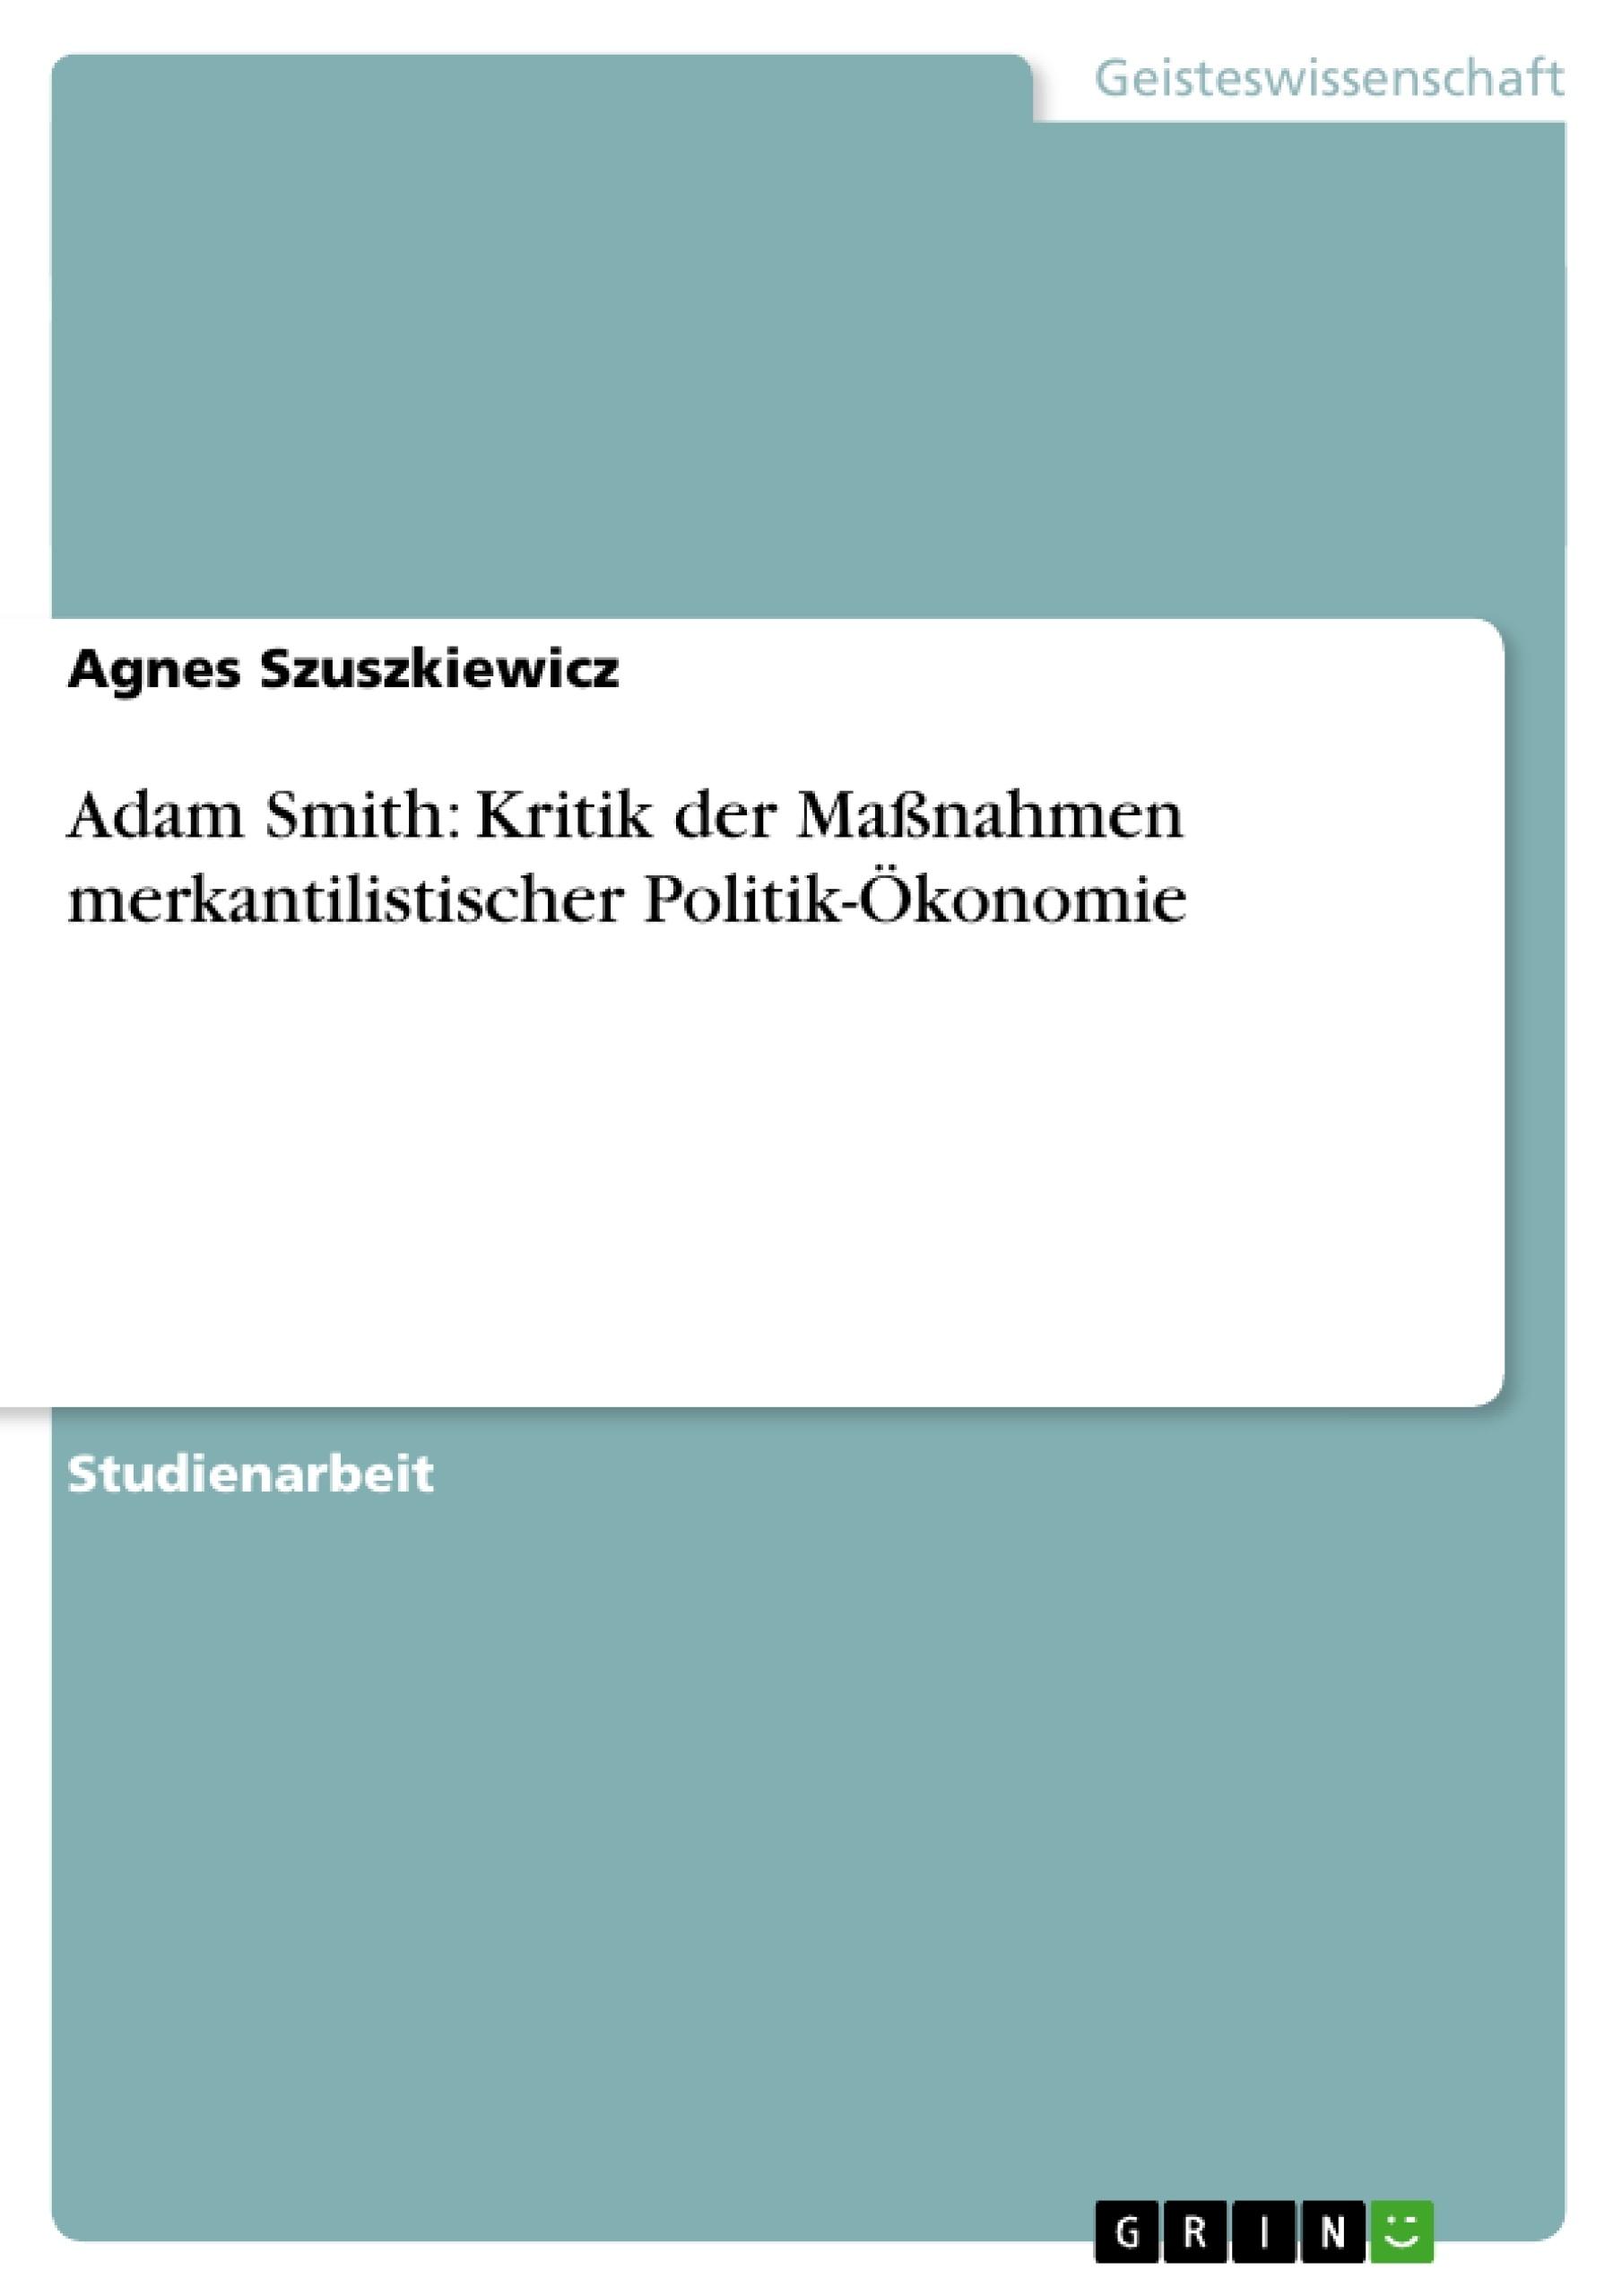 Titel: Adam Smith: Kritik der Maßnahmen merkantilistischer Politik-Ökonomie